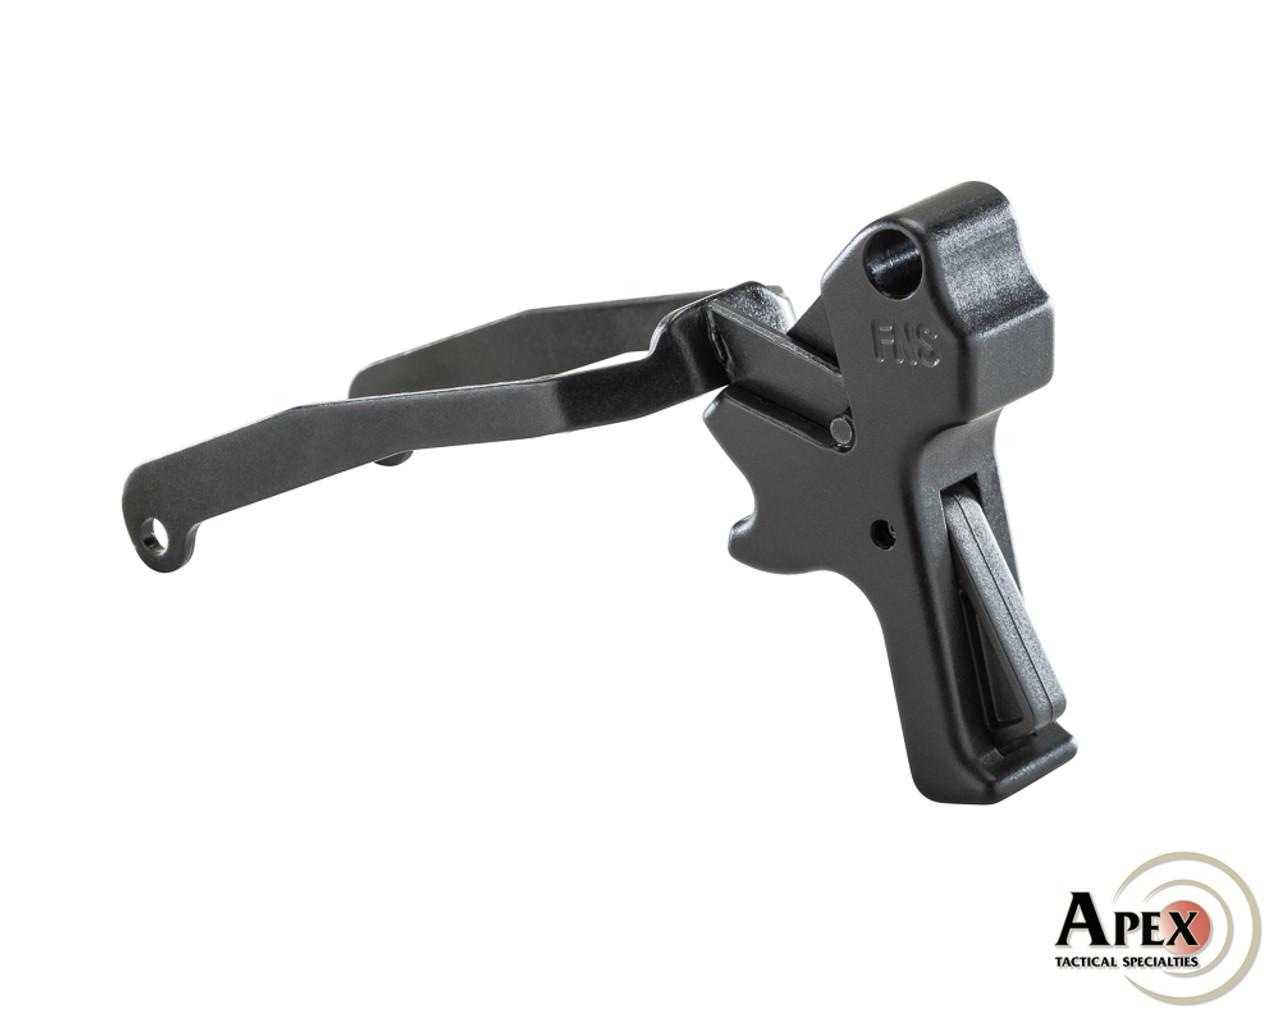 Apex Tactical FNS Action Enhancement Trigger Kit  - Black